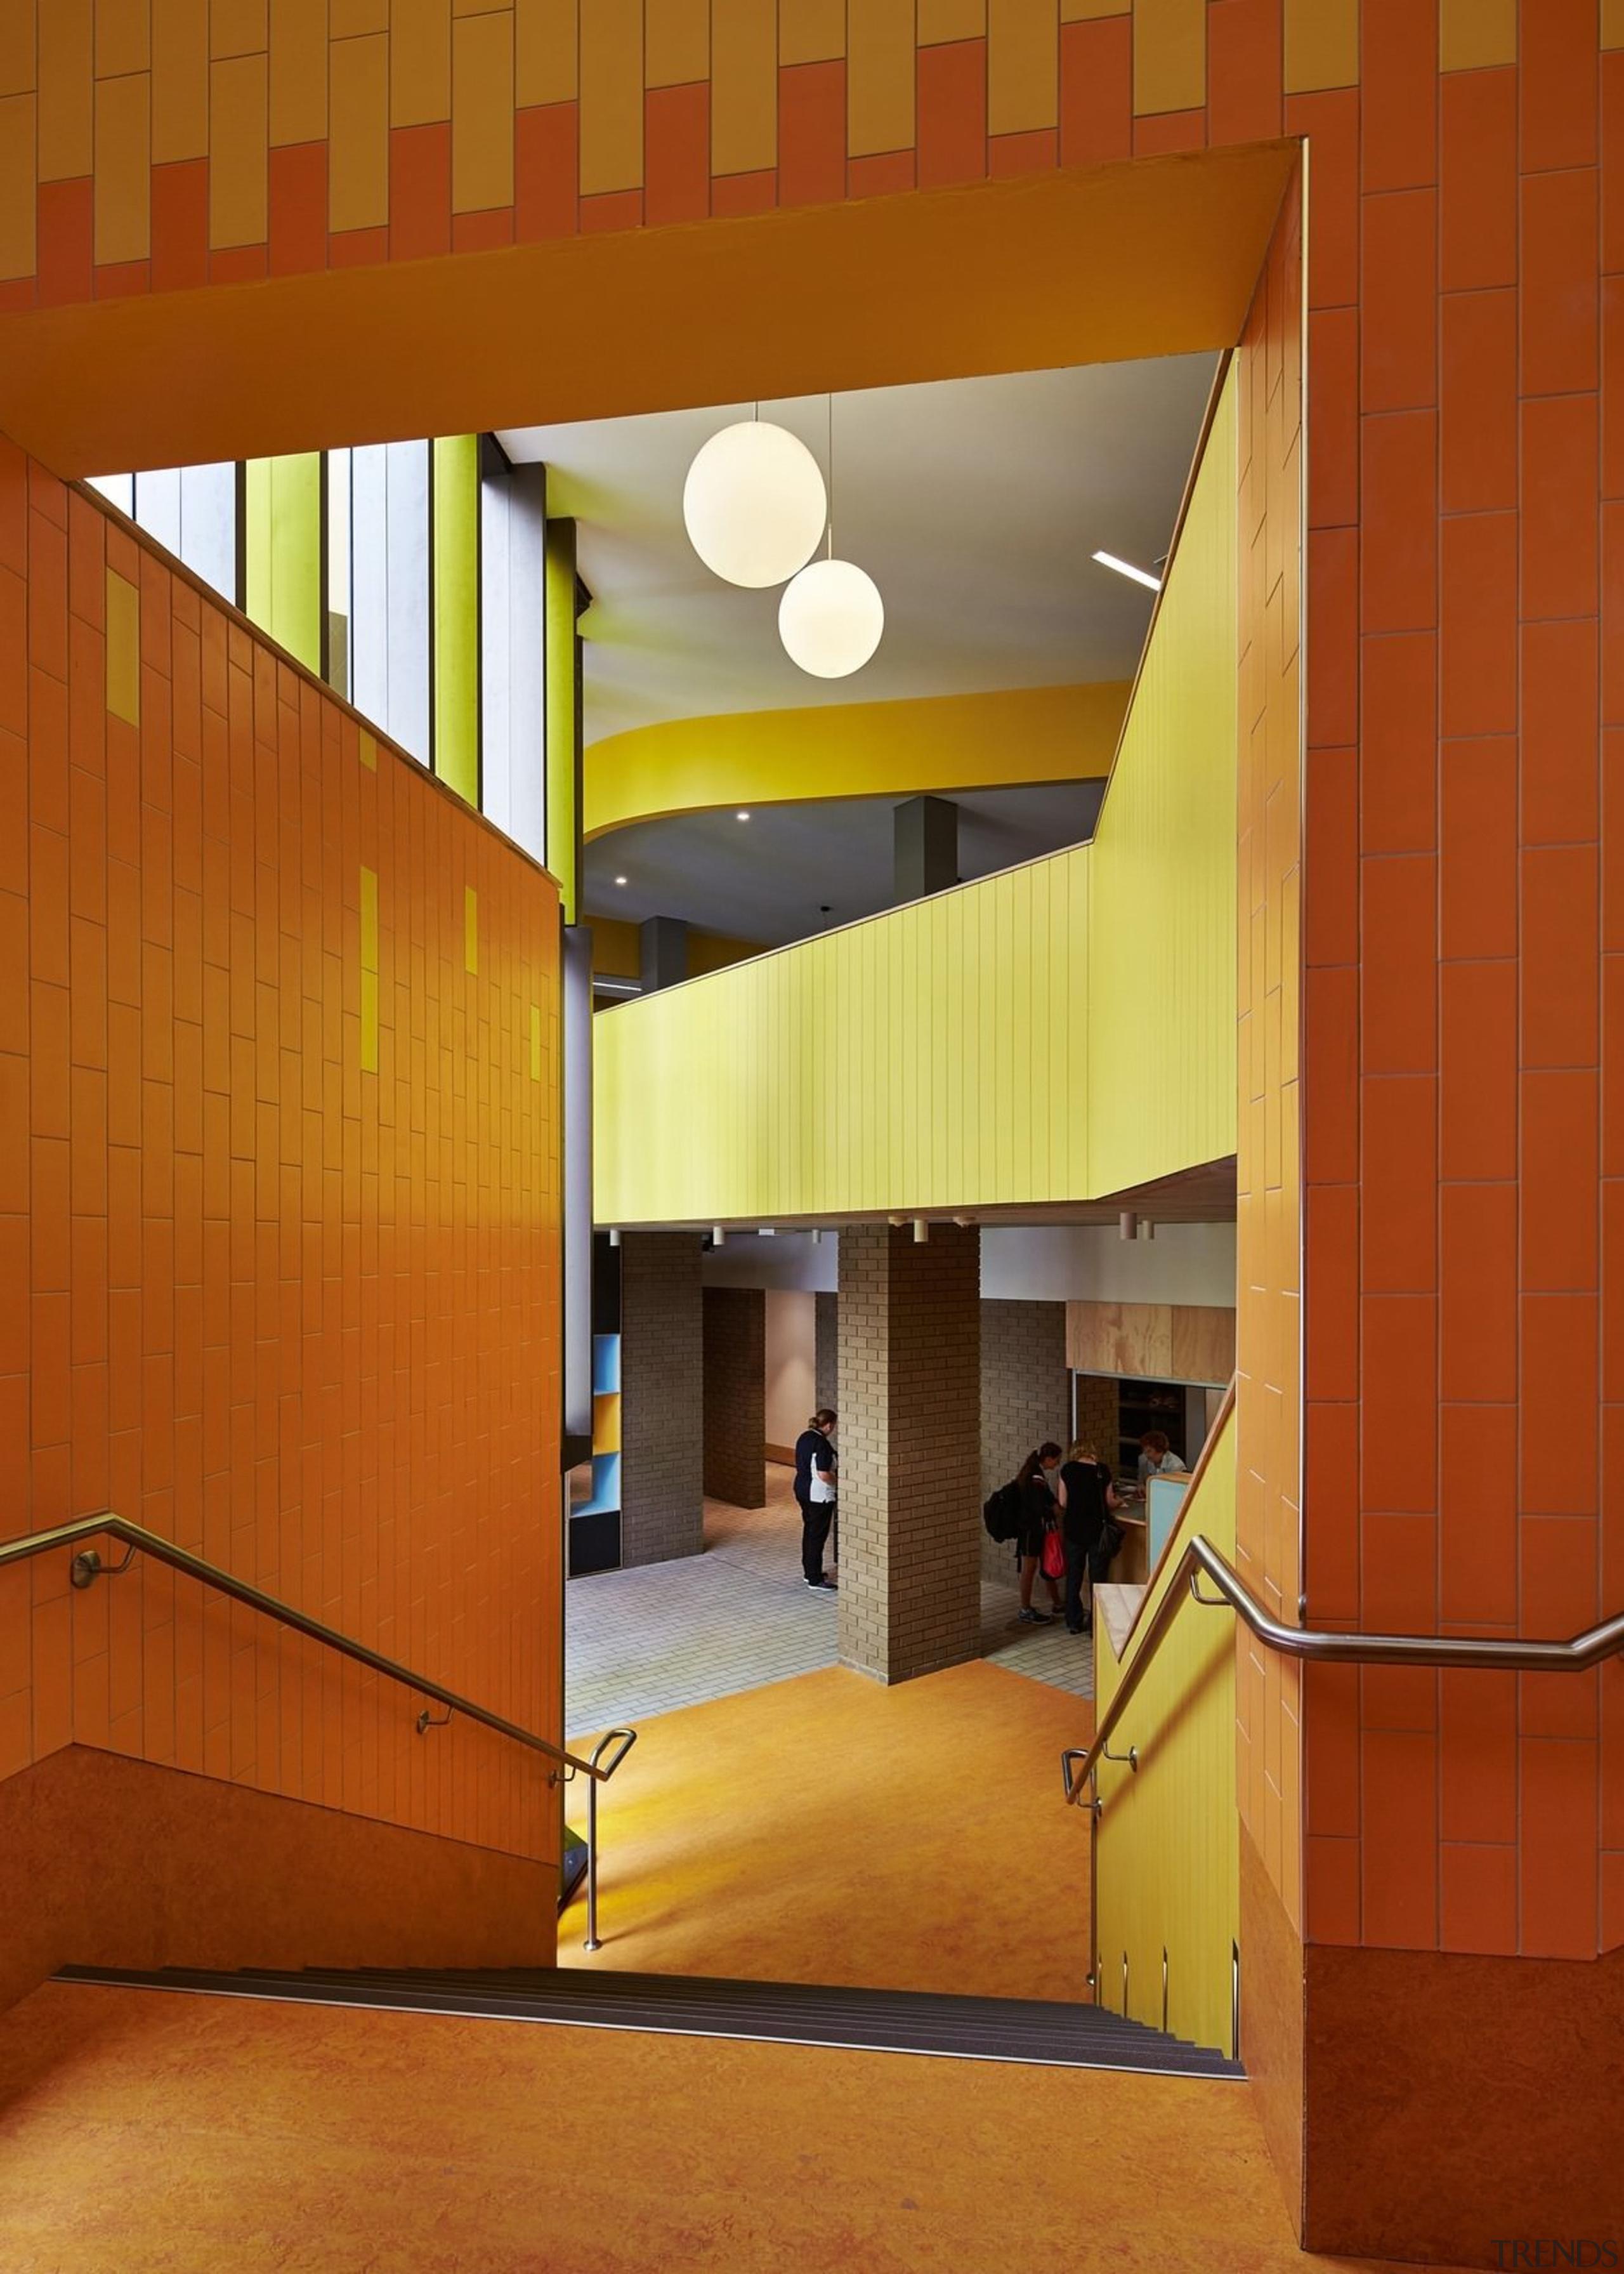 Bunbury Catholic College – Mercy Campus - Bunbury apartment, architecture, ceiling, daylighting, home, house, interior design, lighting, lobby, orange, wall, yellow, brown